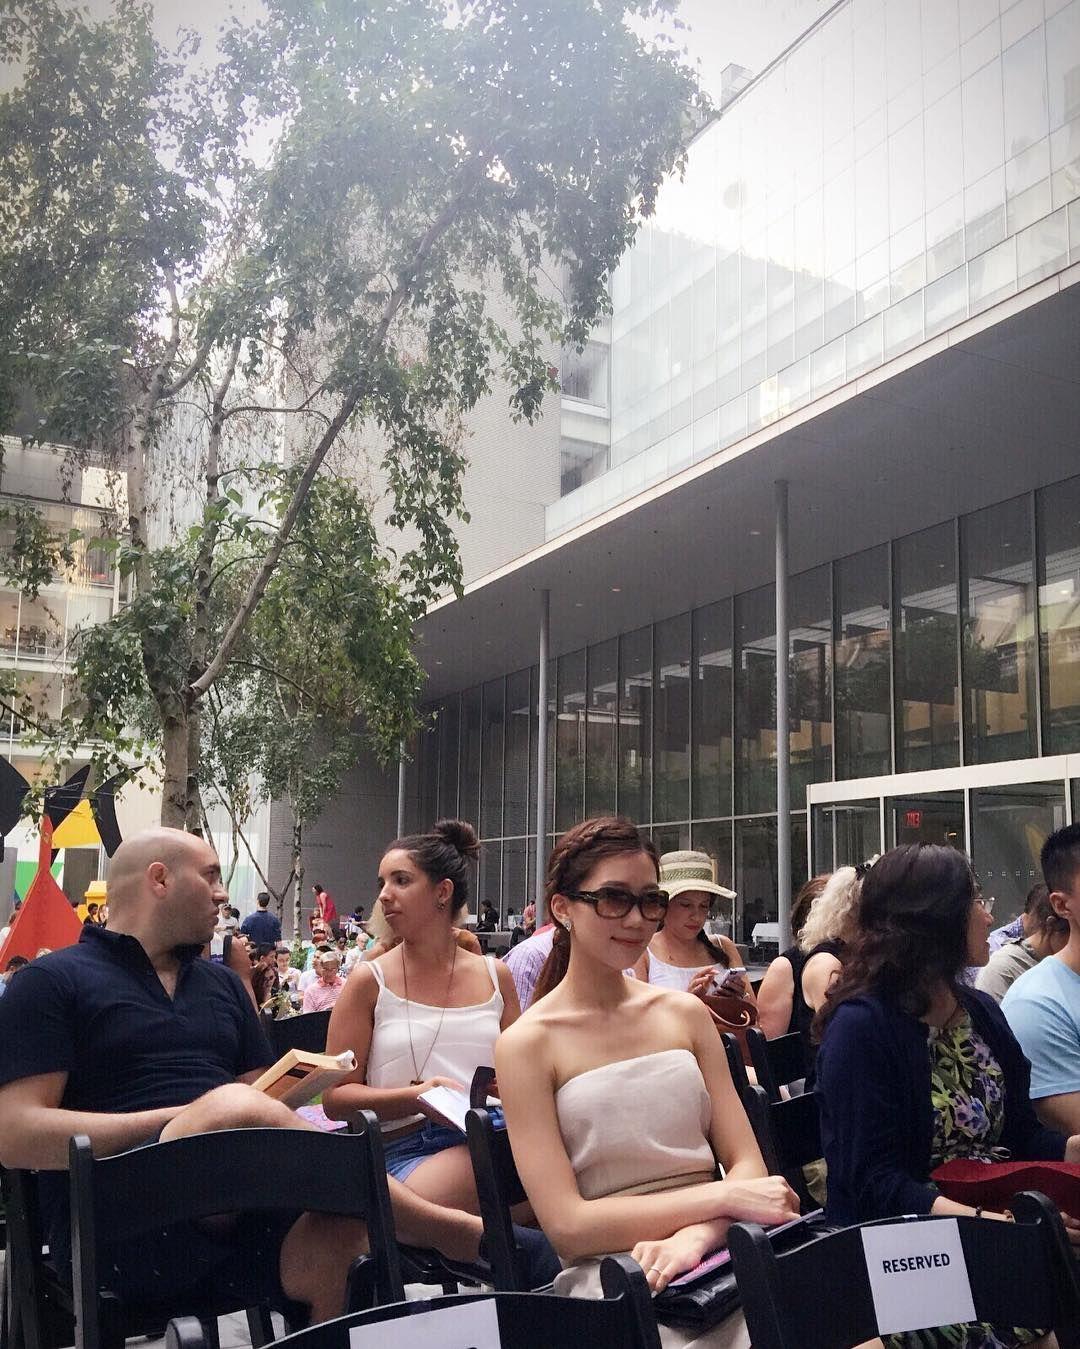 Instagram의 Julie Kim님: Waiting for Summergarden concert @themuseumofmodernart - - #nyc #ny #happysunday #MoMa #Summergarden #뉴욕 #맨해튼 #모마 #썸머가든 #모마콘서트 #주말